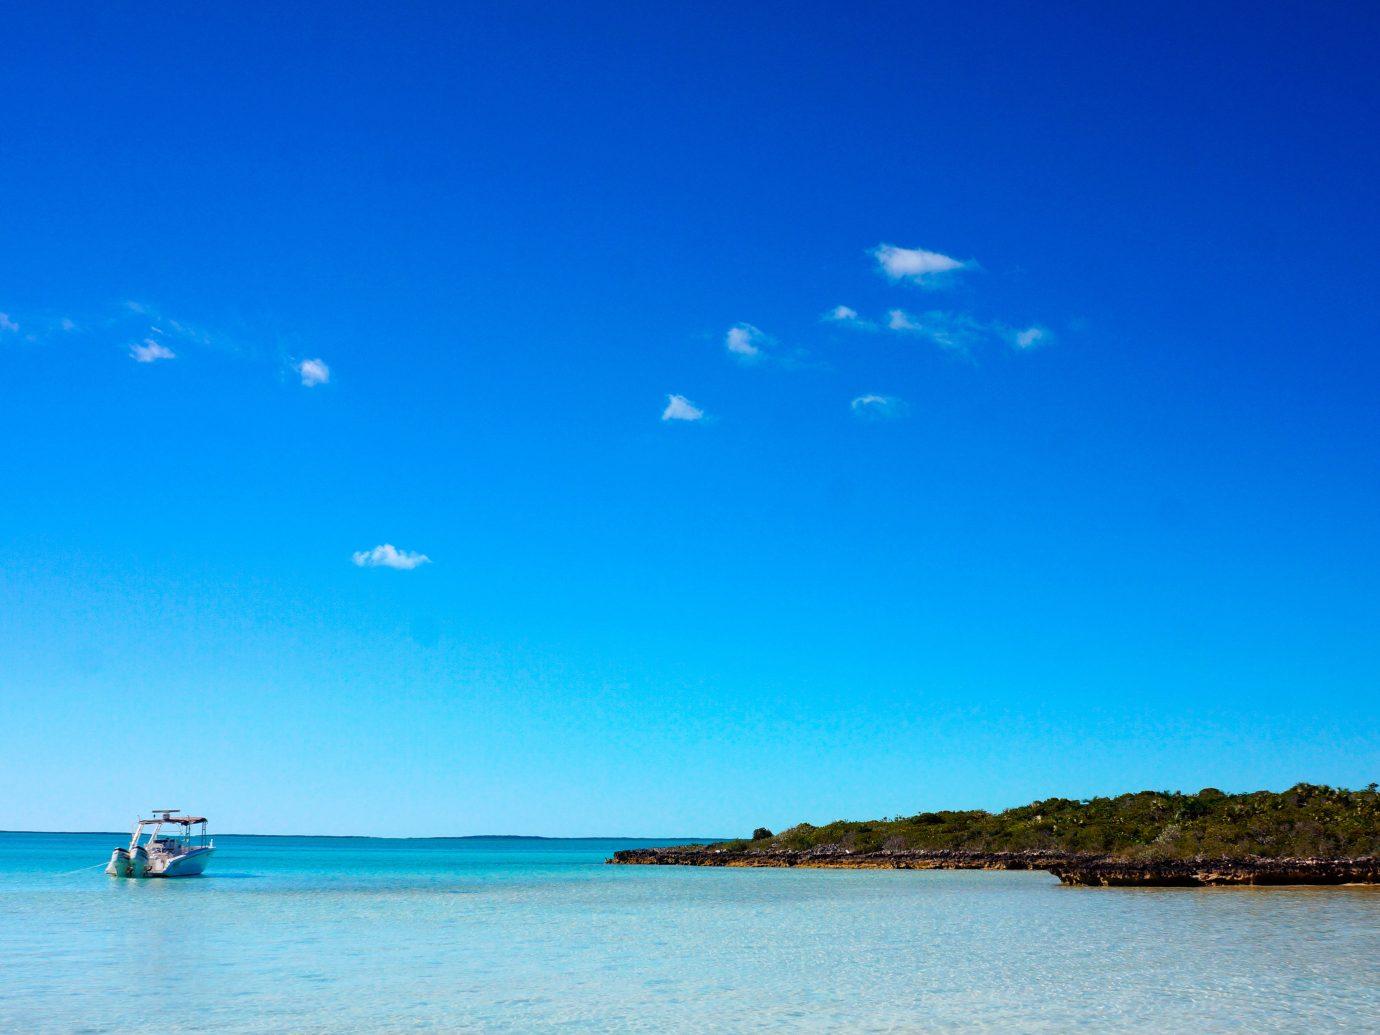 Beach Beachfront Honeymoon Hotels Romance sky water outdoor Boat Sea horizon body of water shore Ocean blue cloud Coast bay Lake dusk Island islet Lagoon distance